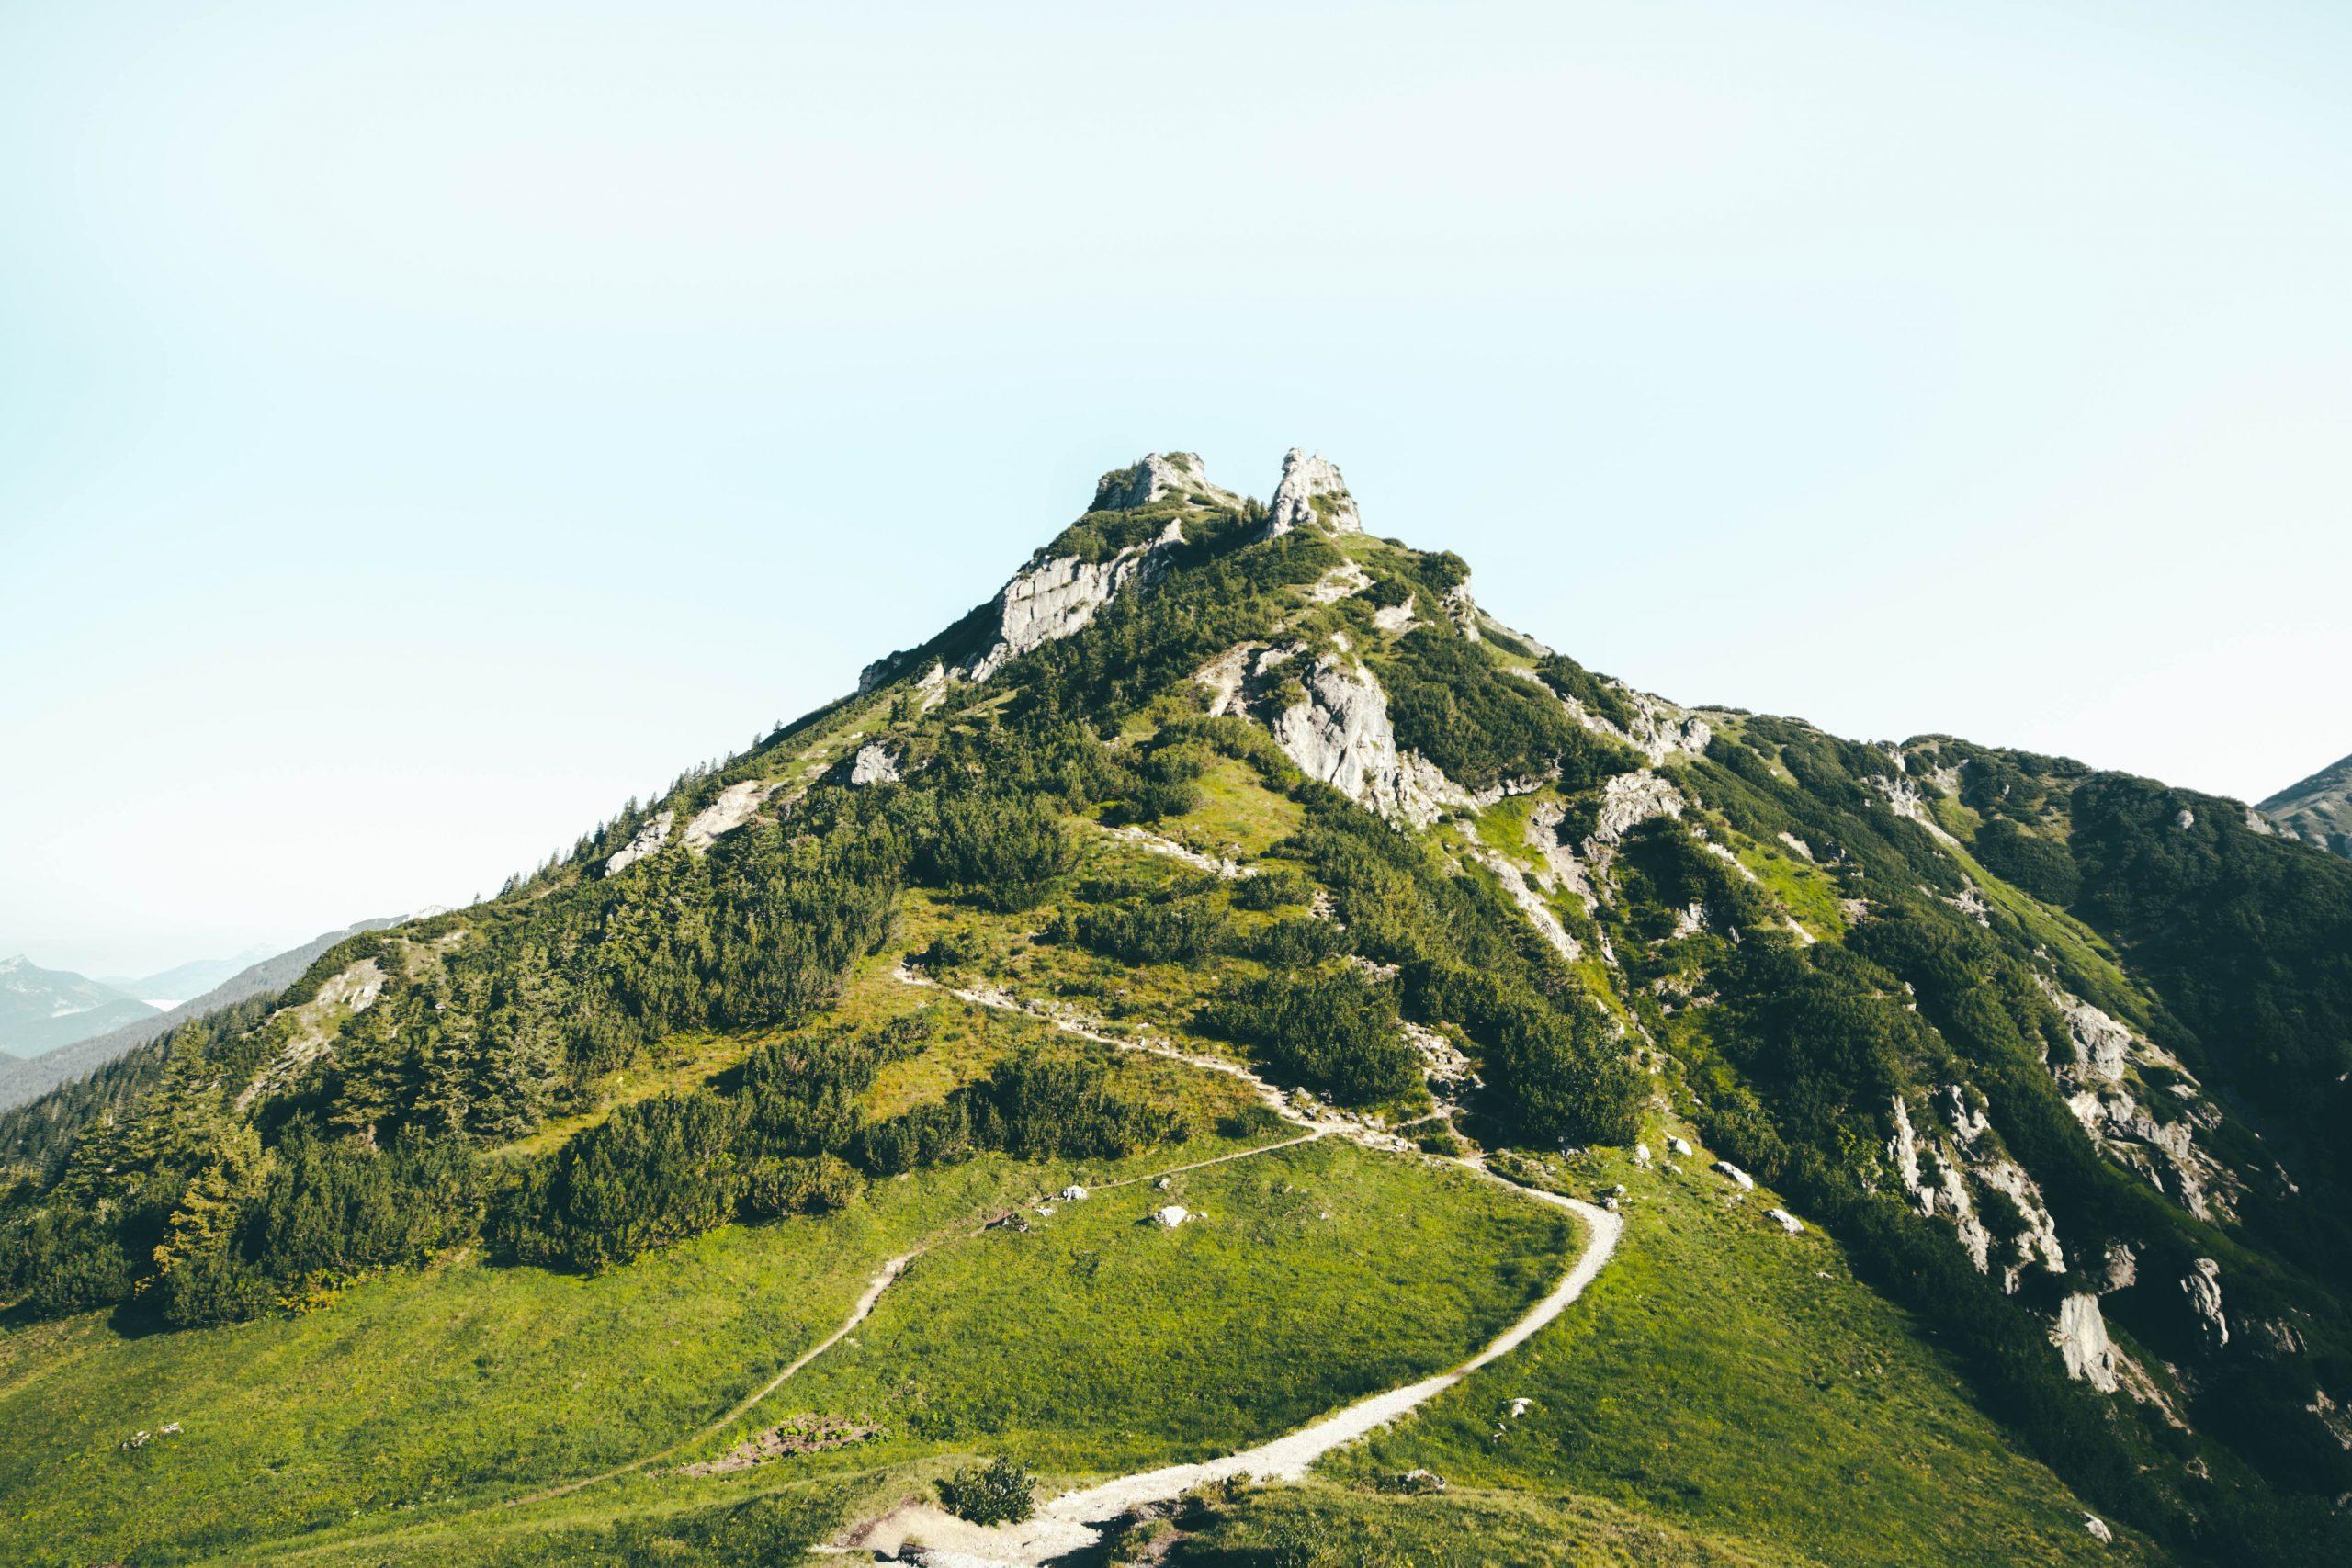 Klettersteig Stripsenjoch - Stripsenkopf, Foto: Michael Schirnhofer I Climbers Paradise